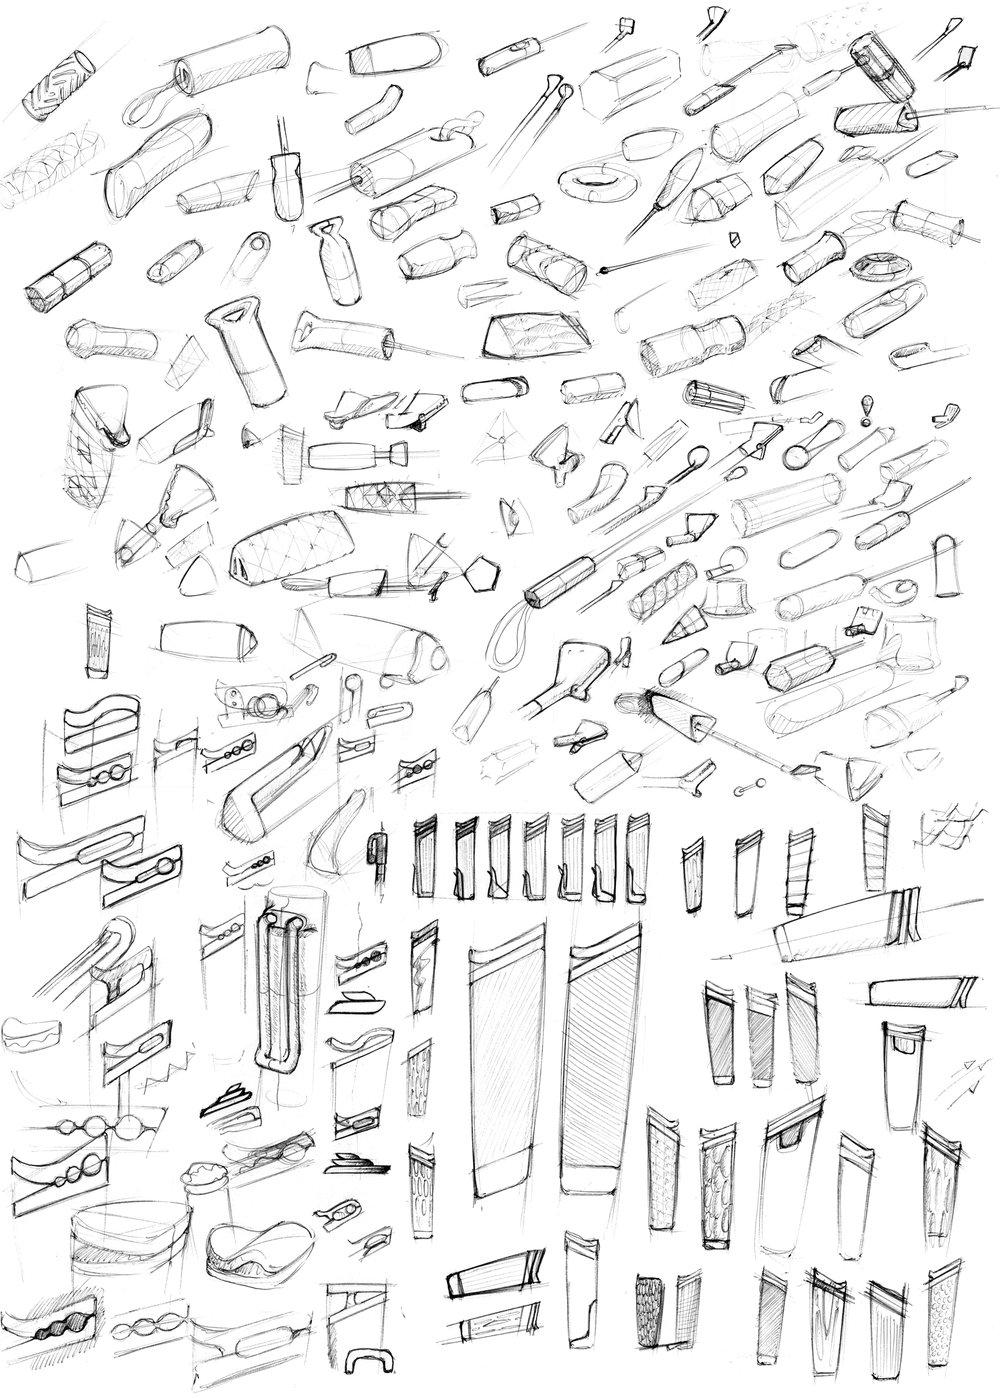 lure-stick-sketches-nicholas-baker